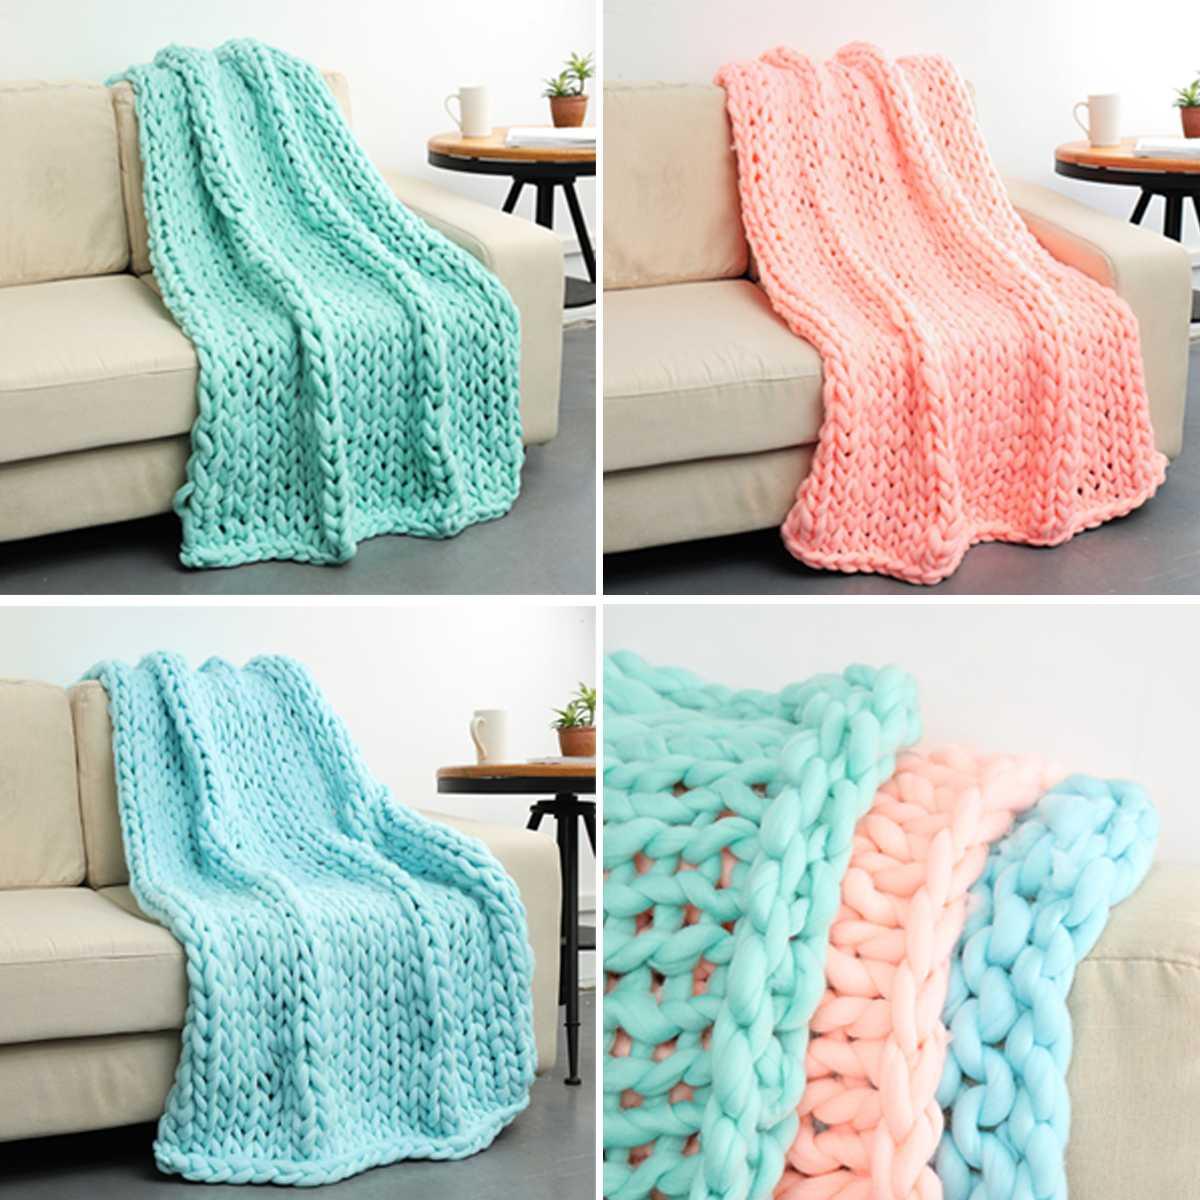 Warm Winter Sofa Chunky Knit Blanket Handmade Thick Line ...